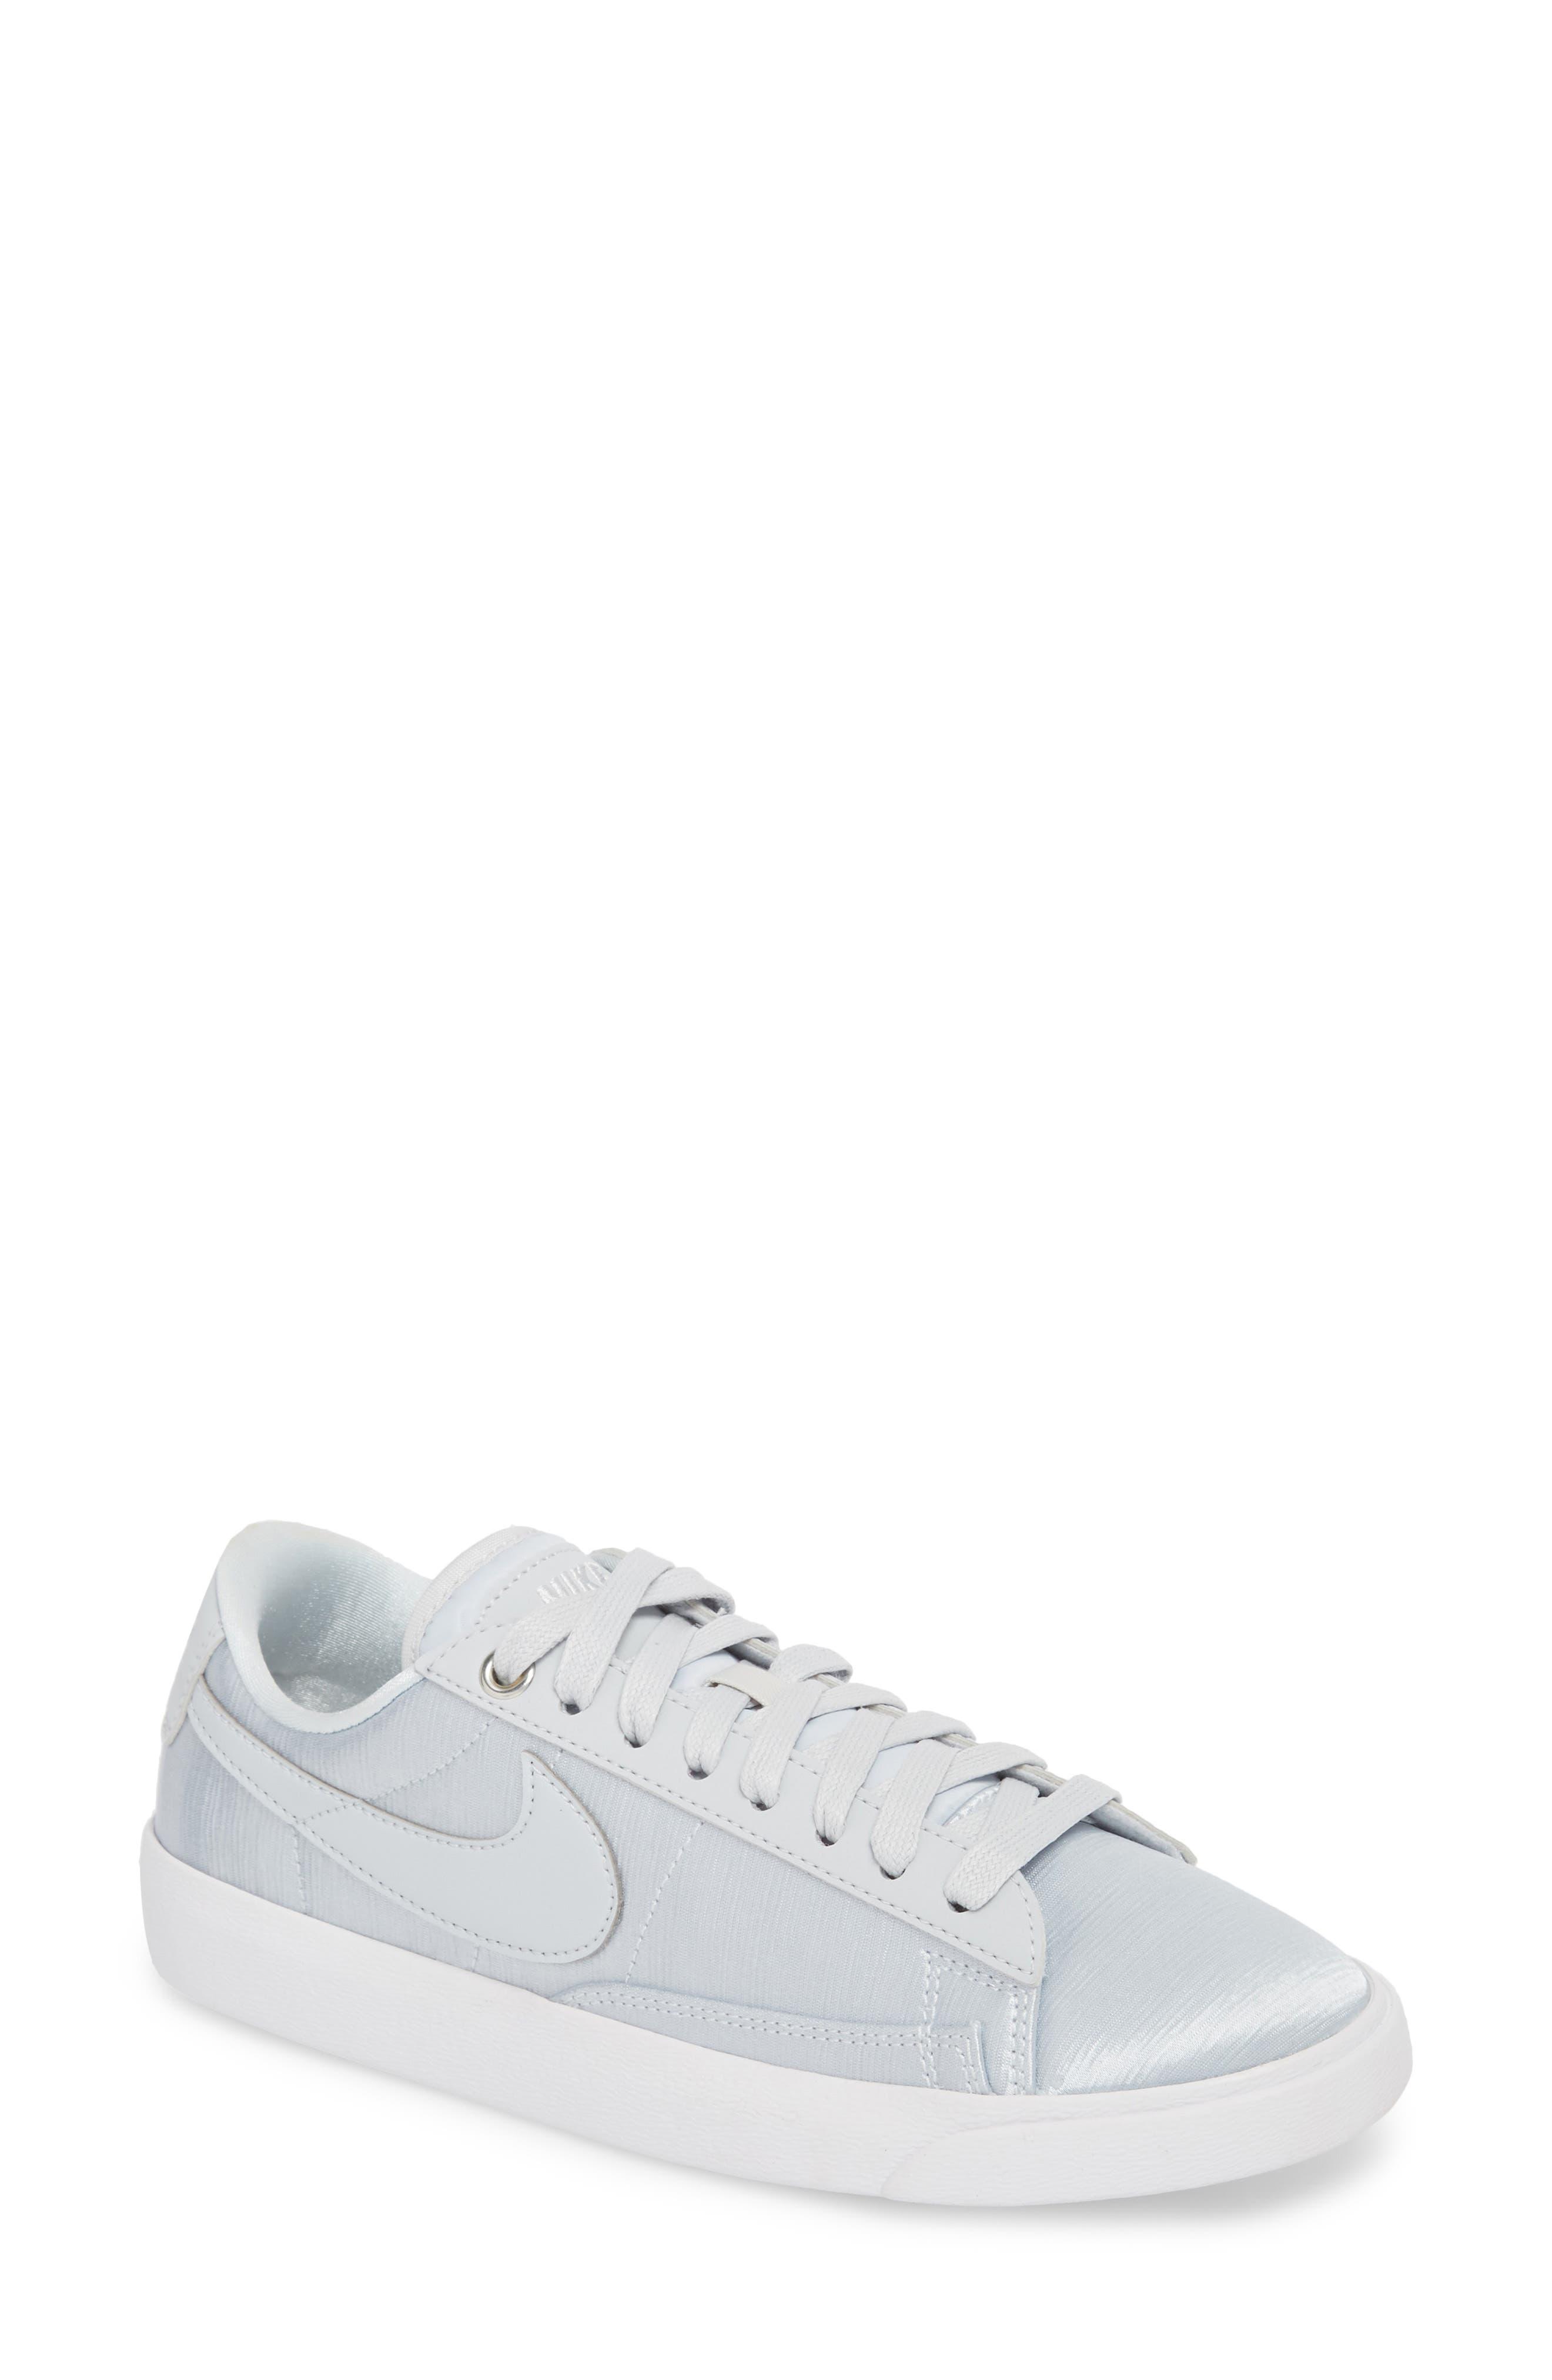 Blazer Low Top Sneaker SE,                         Main,                         color, 040